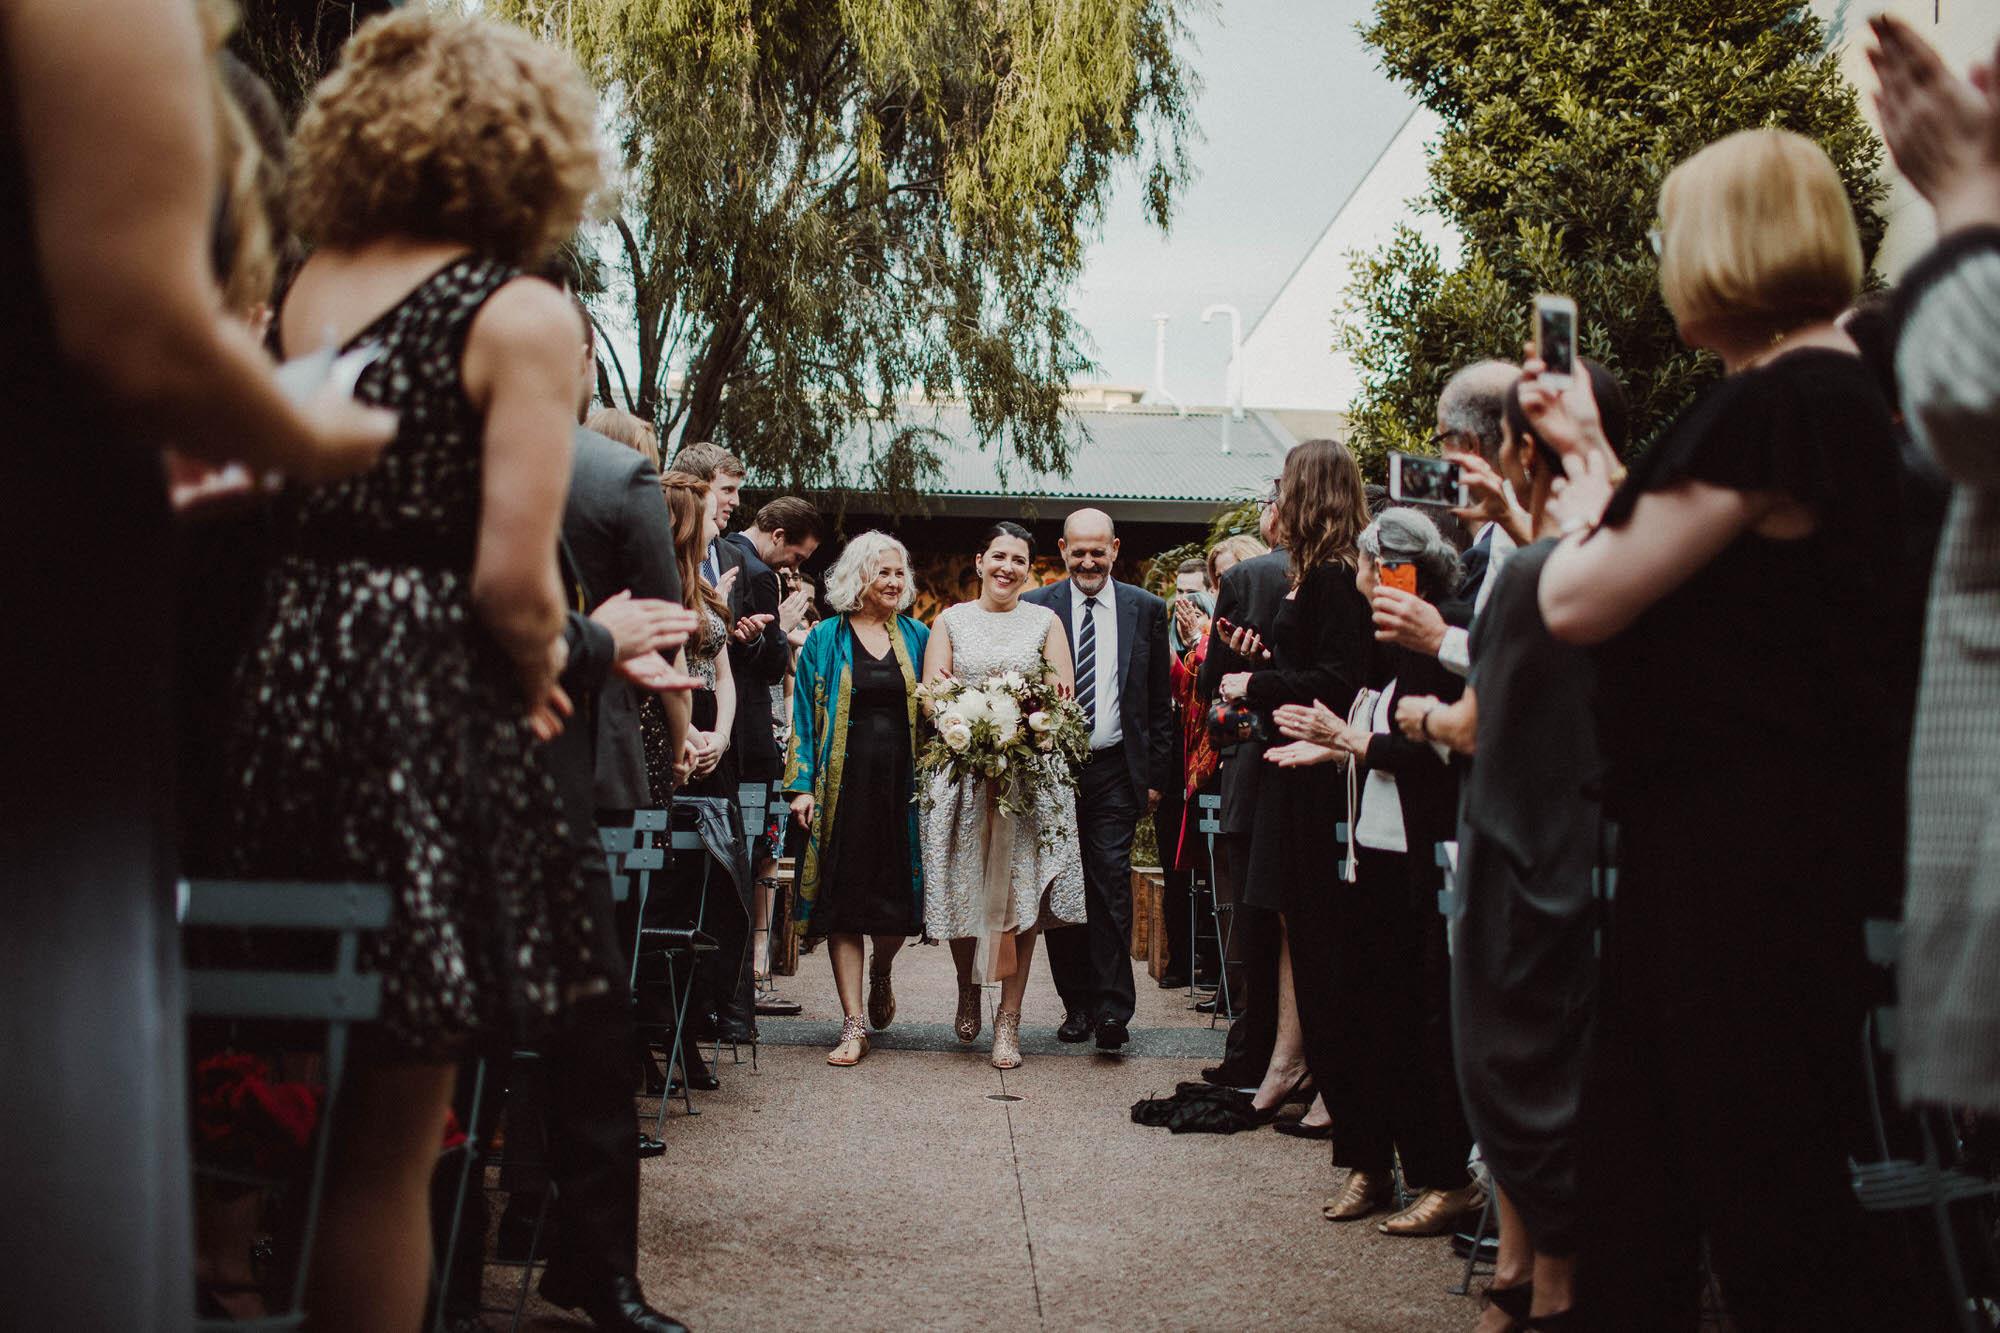 los-angeles-wedding-photographer-millwick-97.jpg